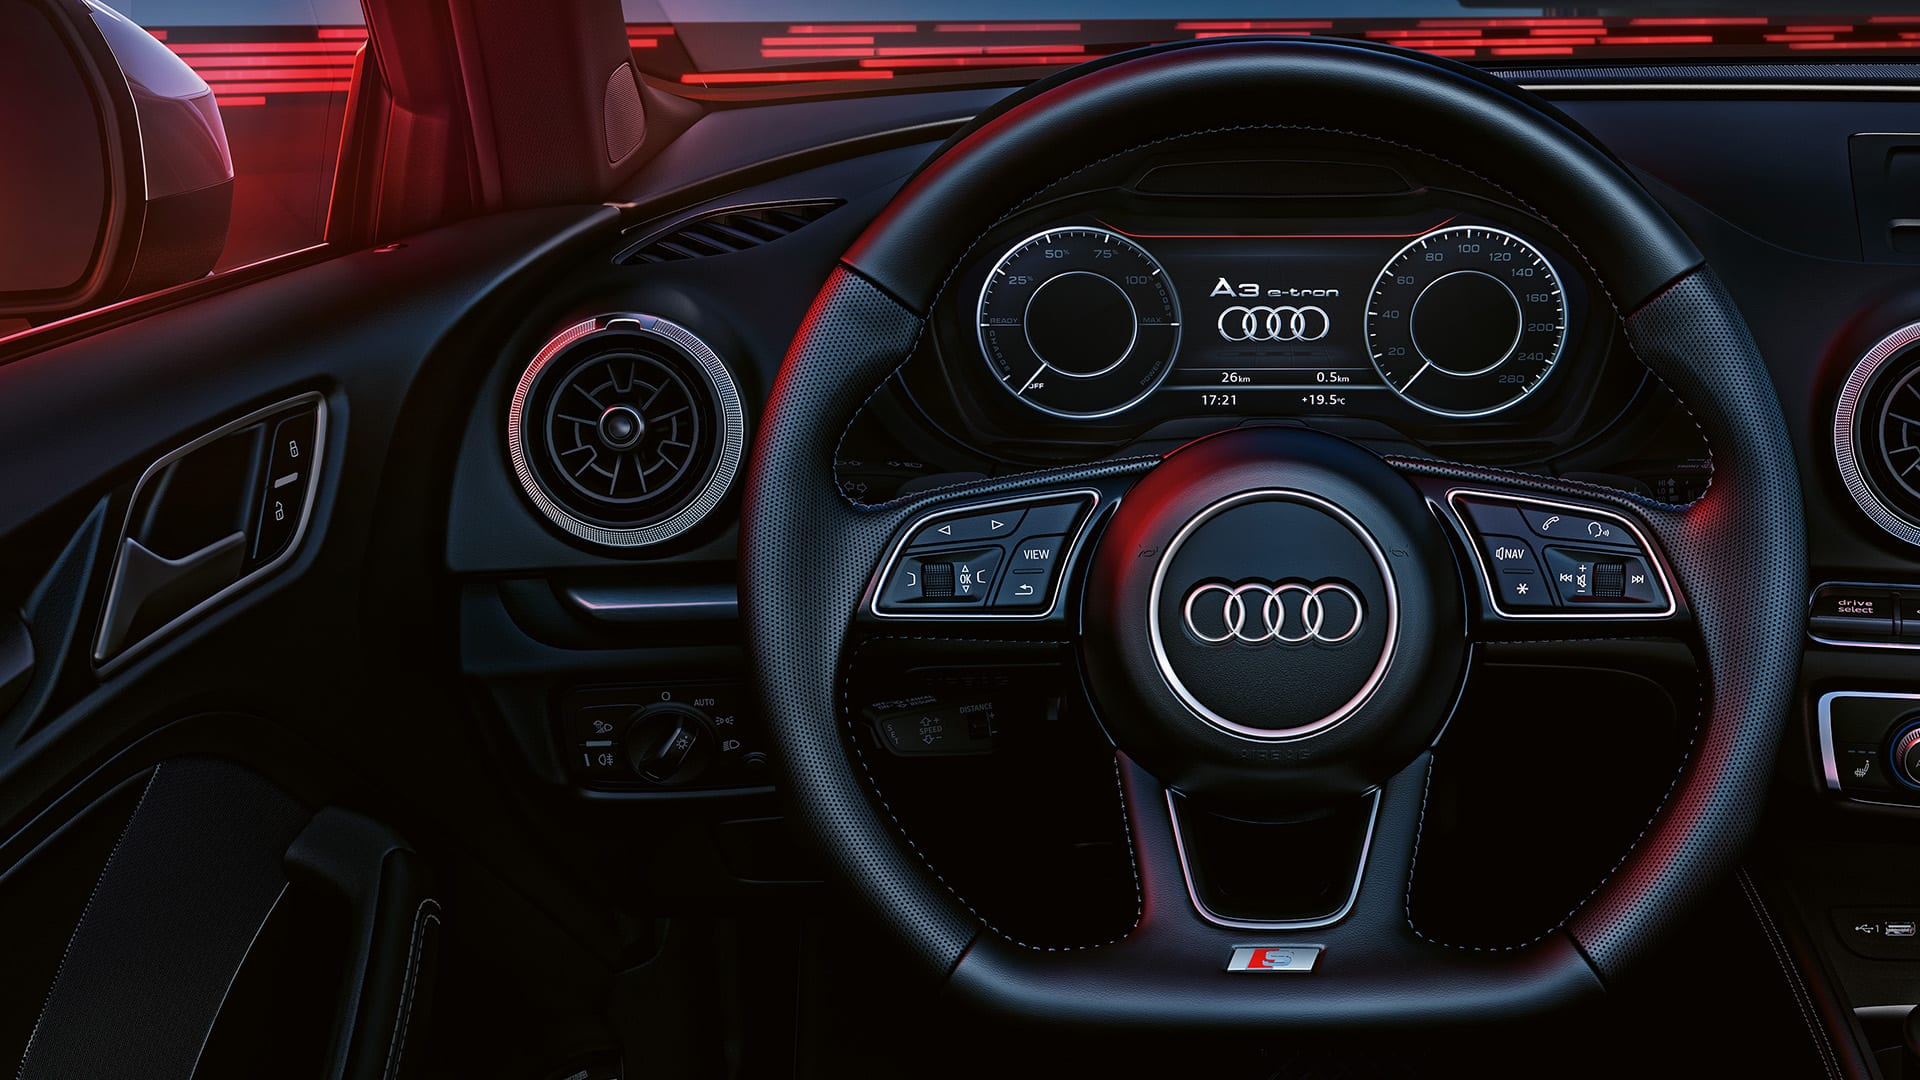 A3 Sportback e-tron > Audi Deutschland   {Auto cockpit erklärung<br /> 75}&#8216; title=